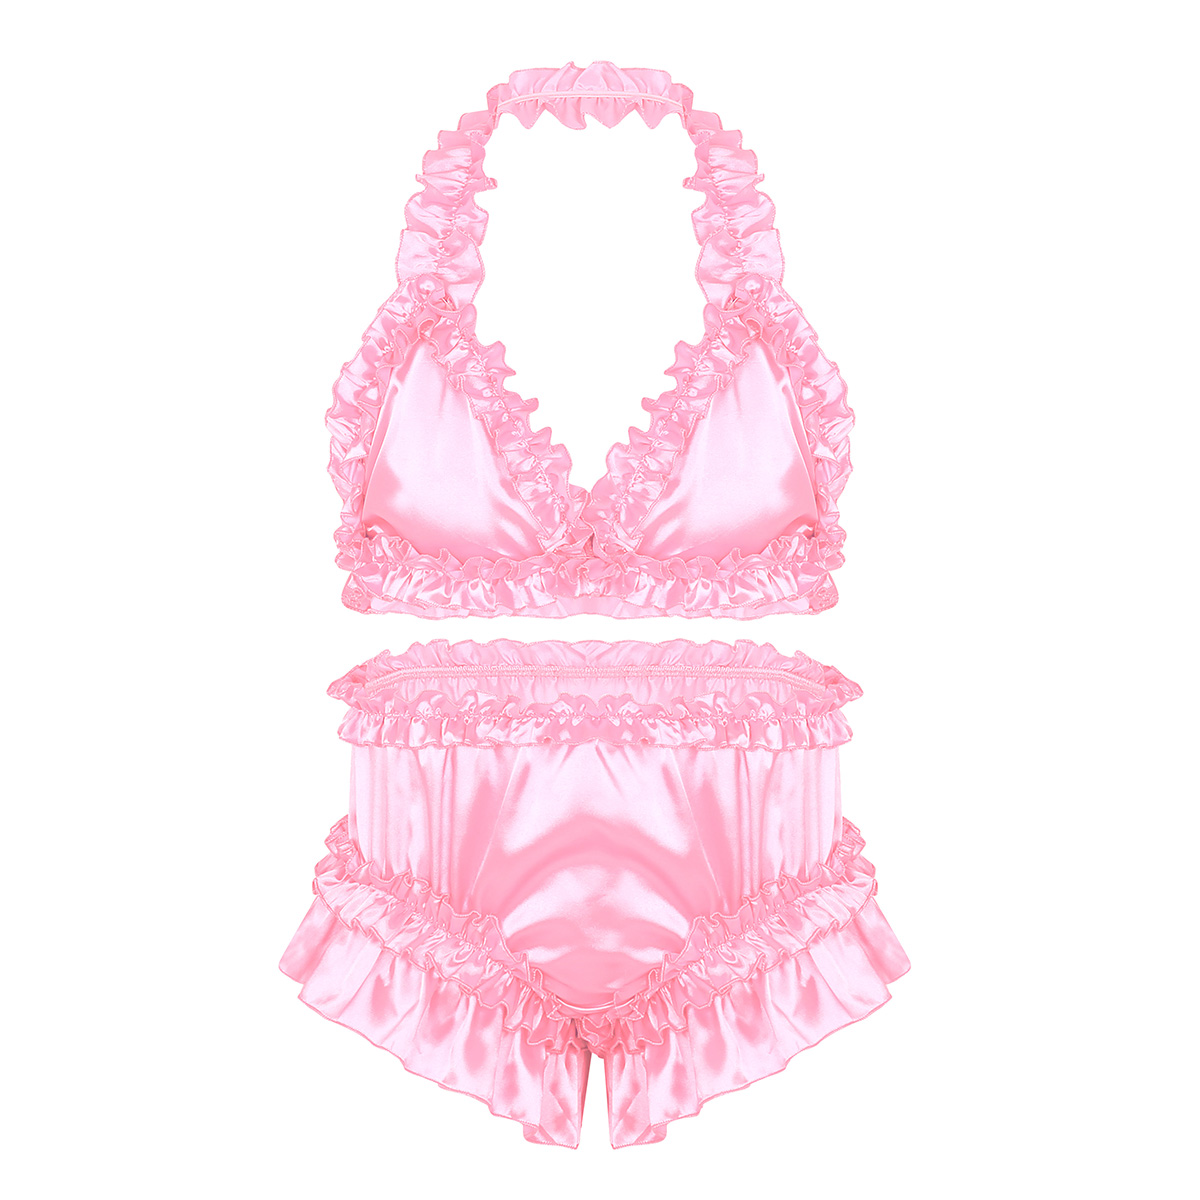 Mens Satin Sissy Frilly Ruffled Elastic Lingerie Set Bikini Bra Top Crossdress